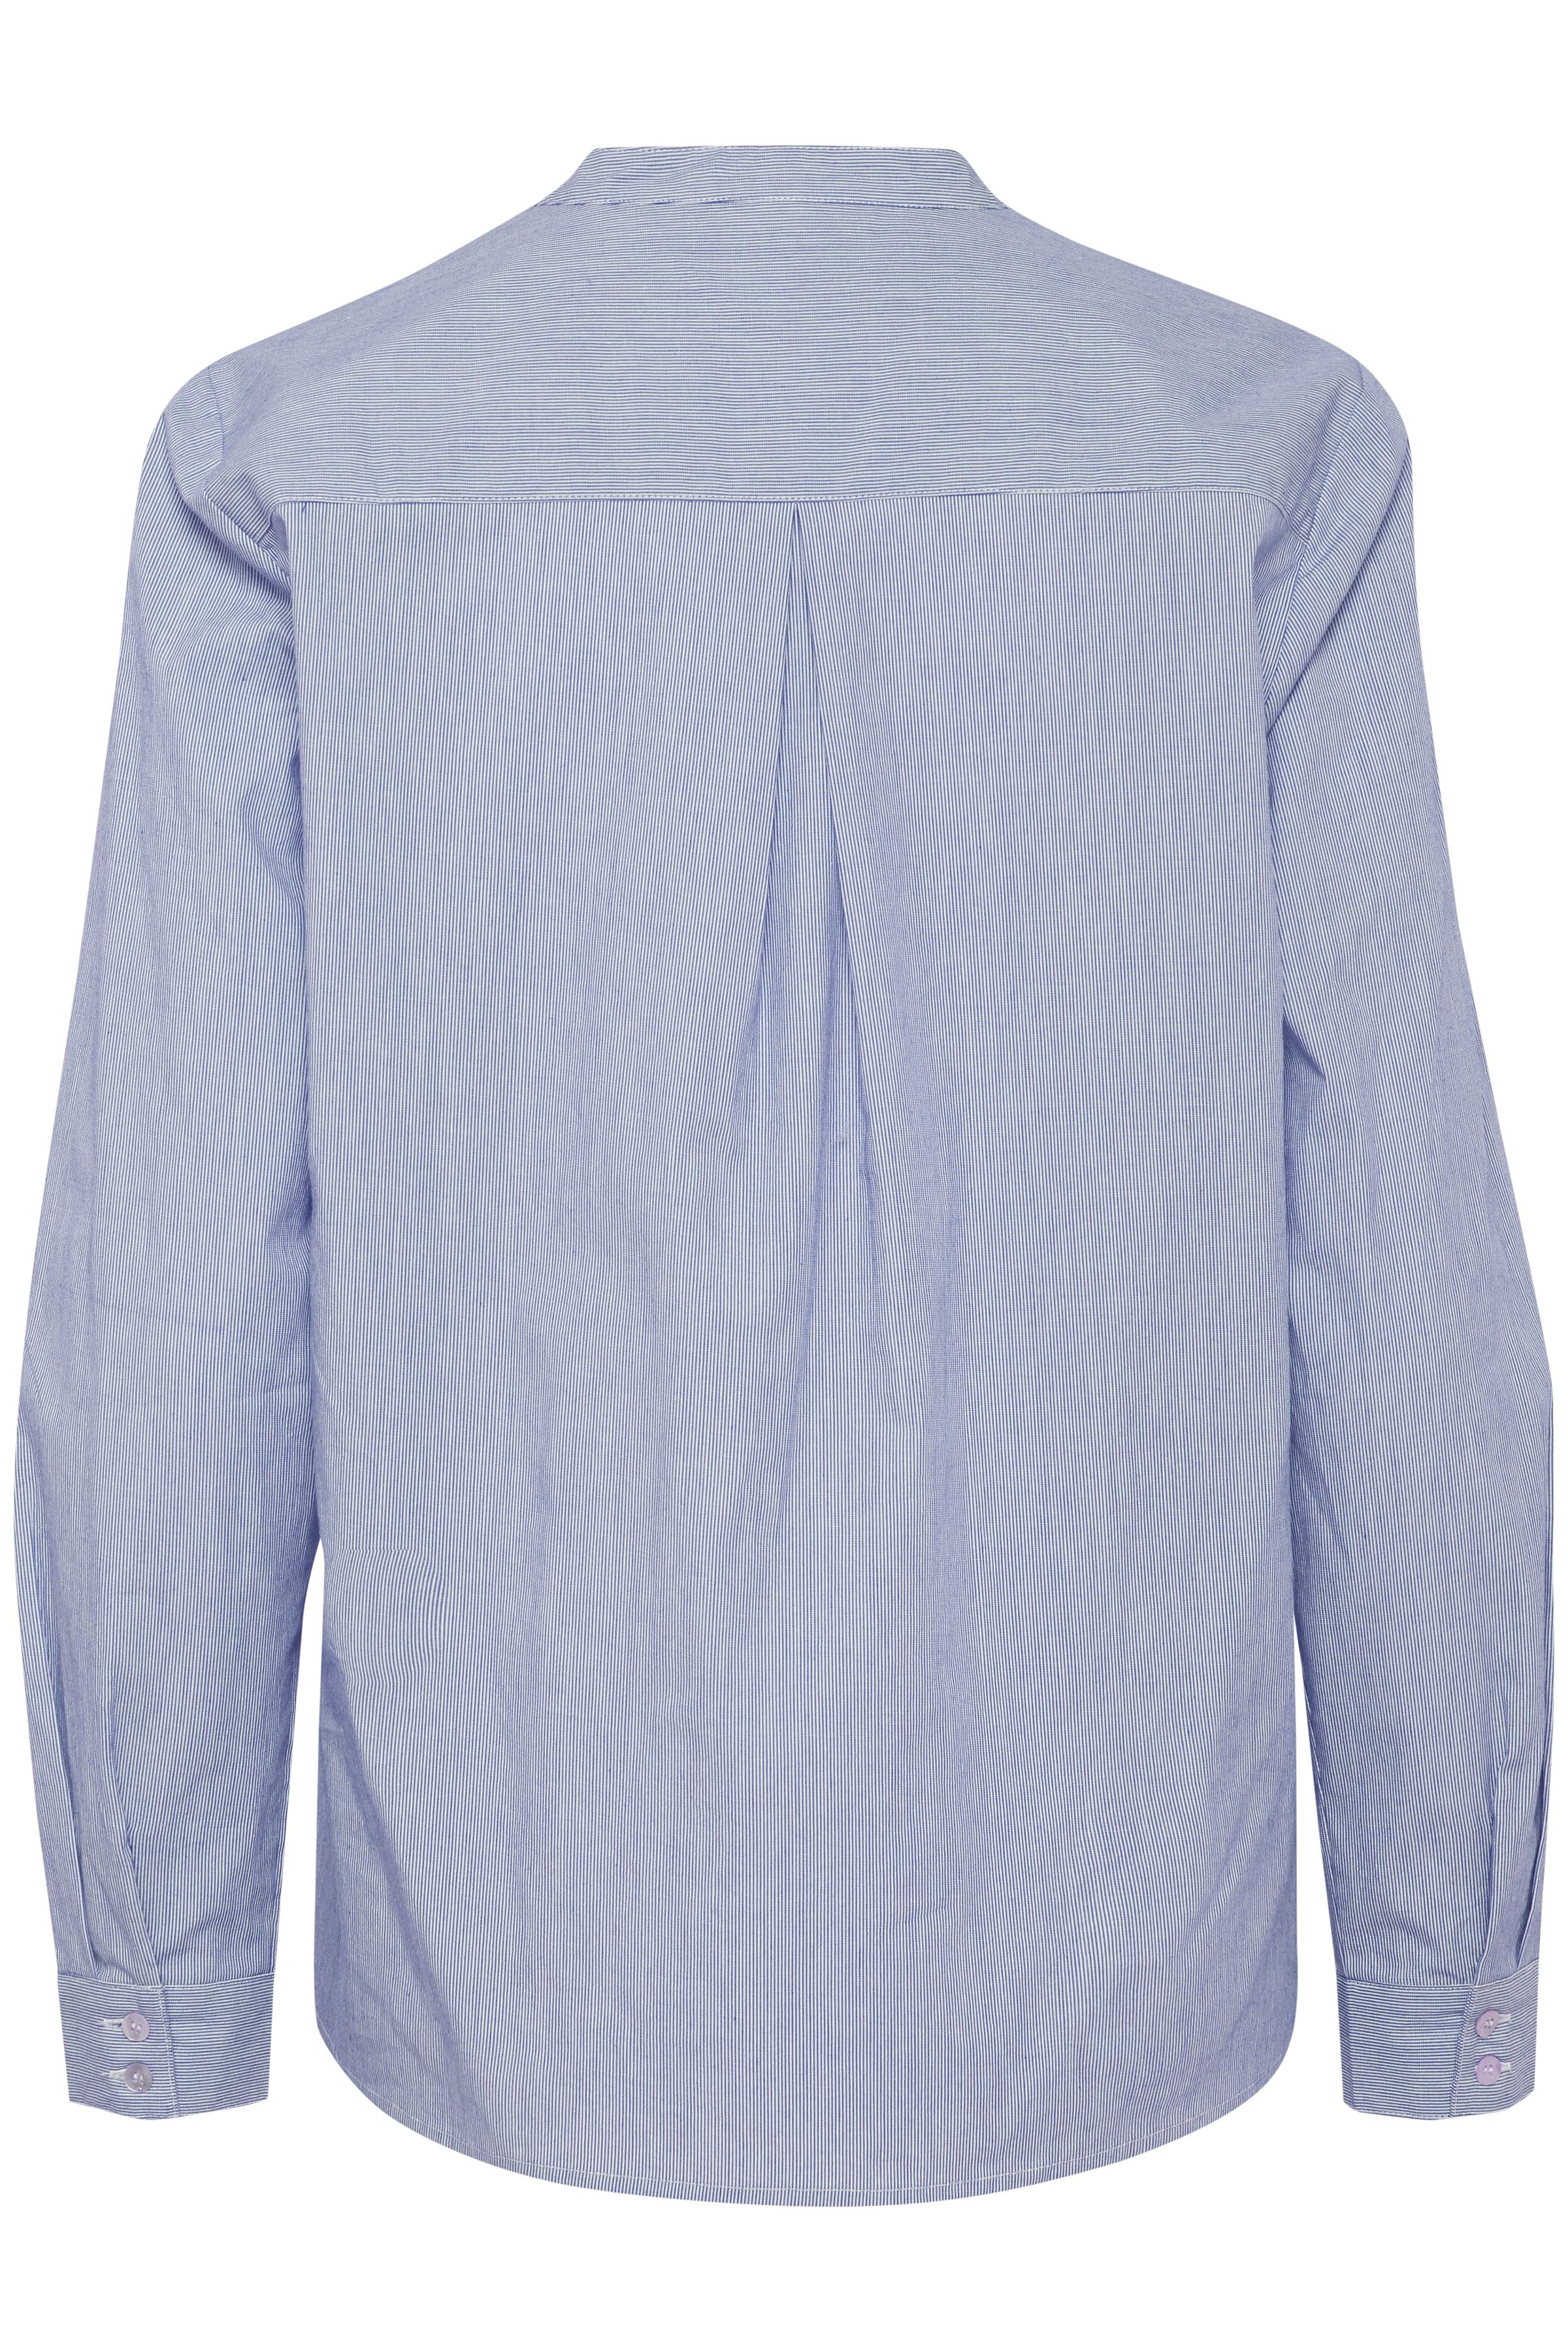 Blue Marine Langærmet skjorte – Køb Blue Marine Langærmet skjorte fra str. XS-XXL her